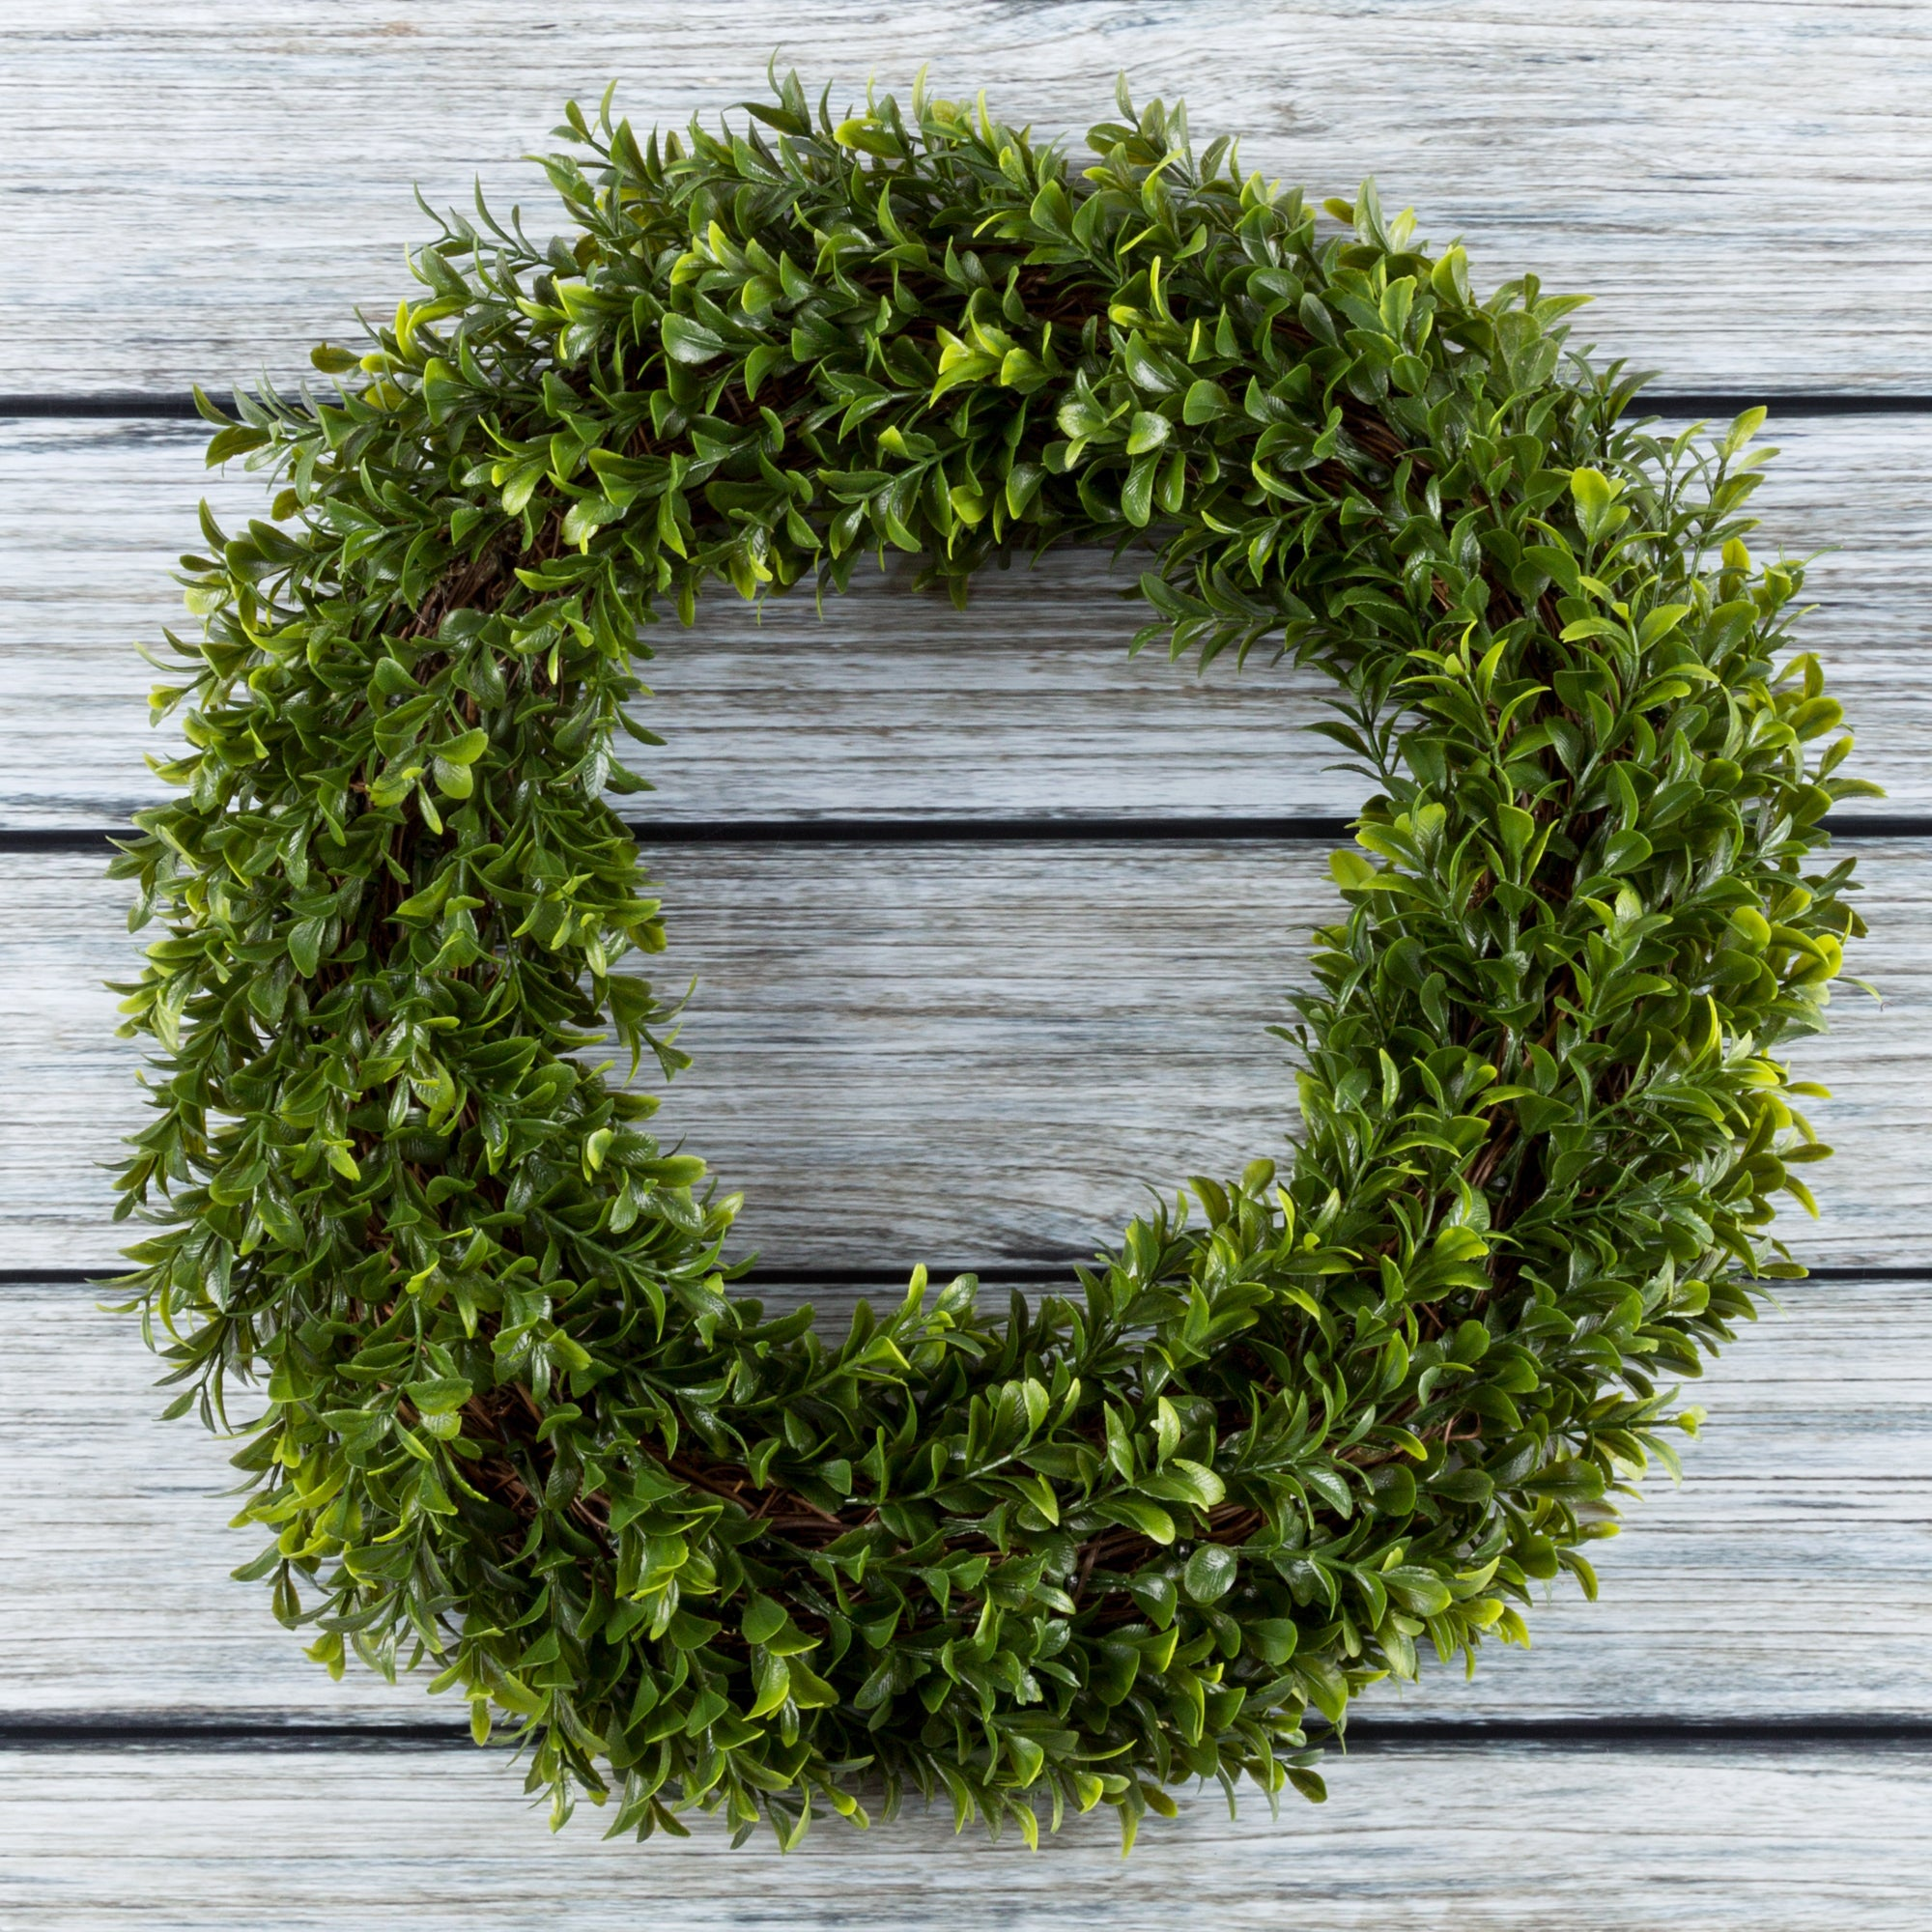 Artificial Hedyotis 15 Inch Round Wreath By Pure Garden Overstock 14443195